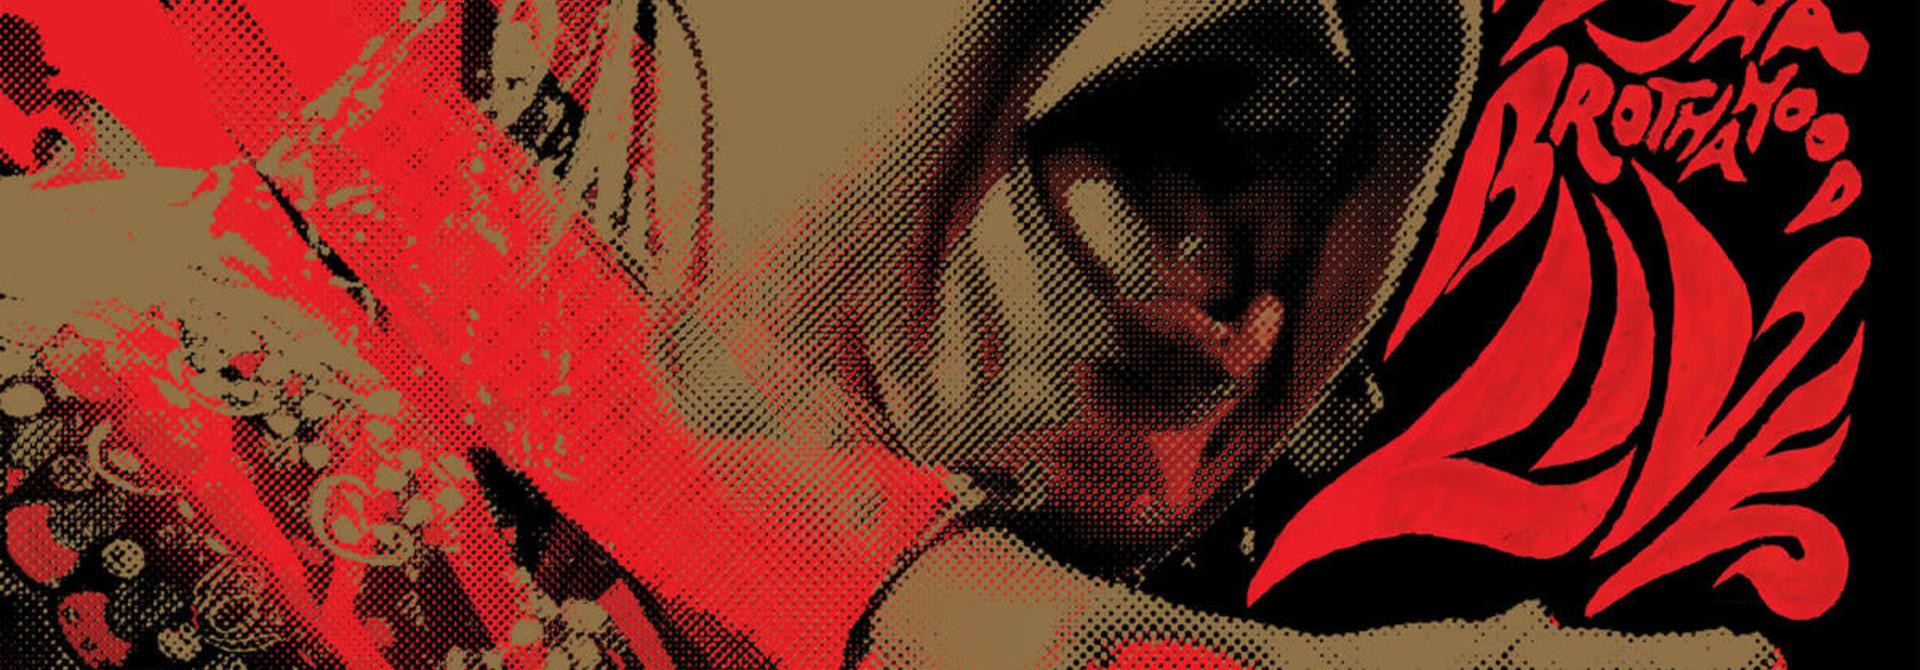 Angel Bat Dawid & Tha Brothahood • LIVE